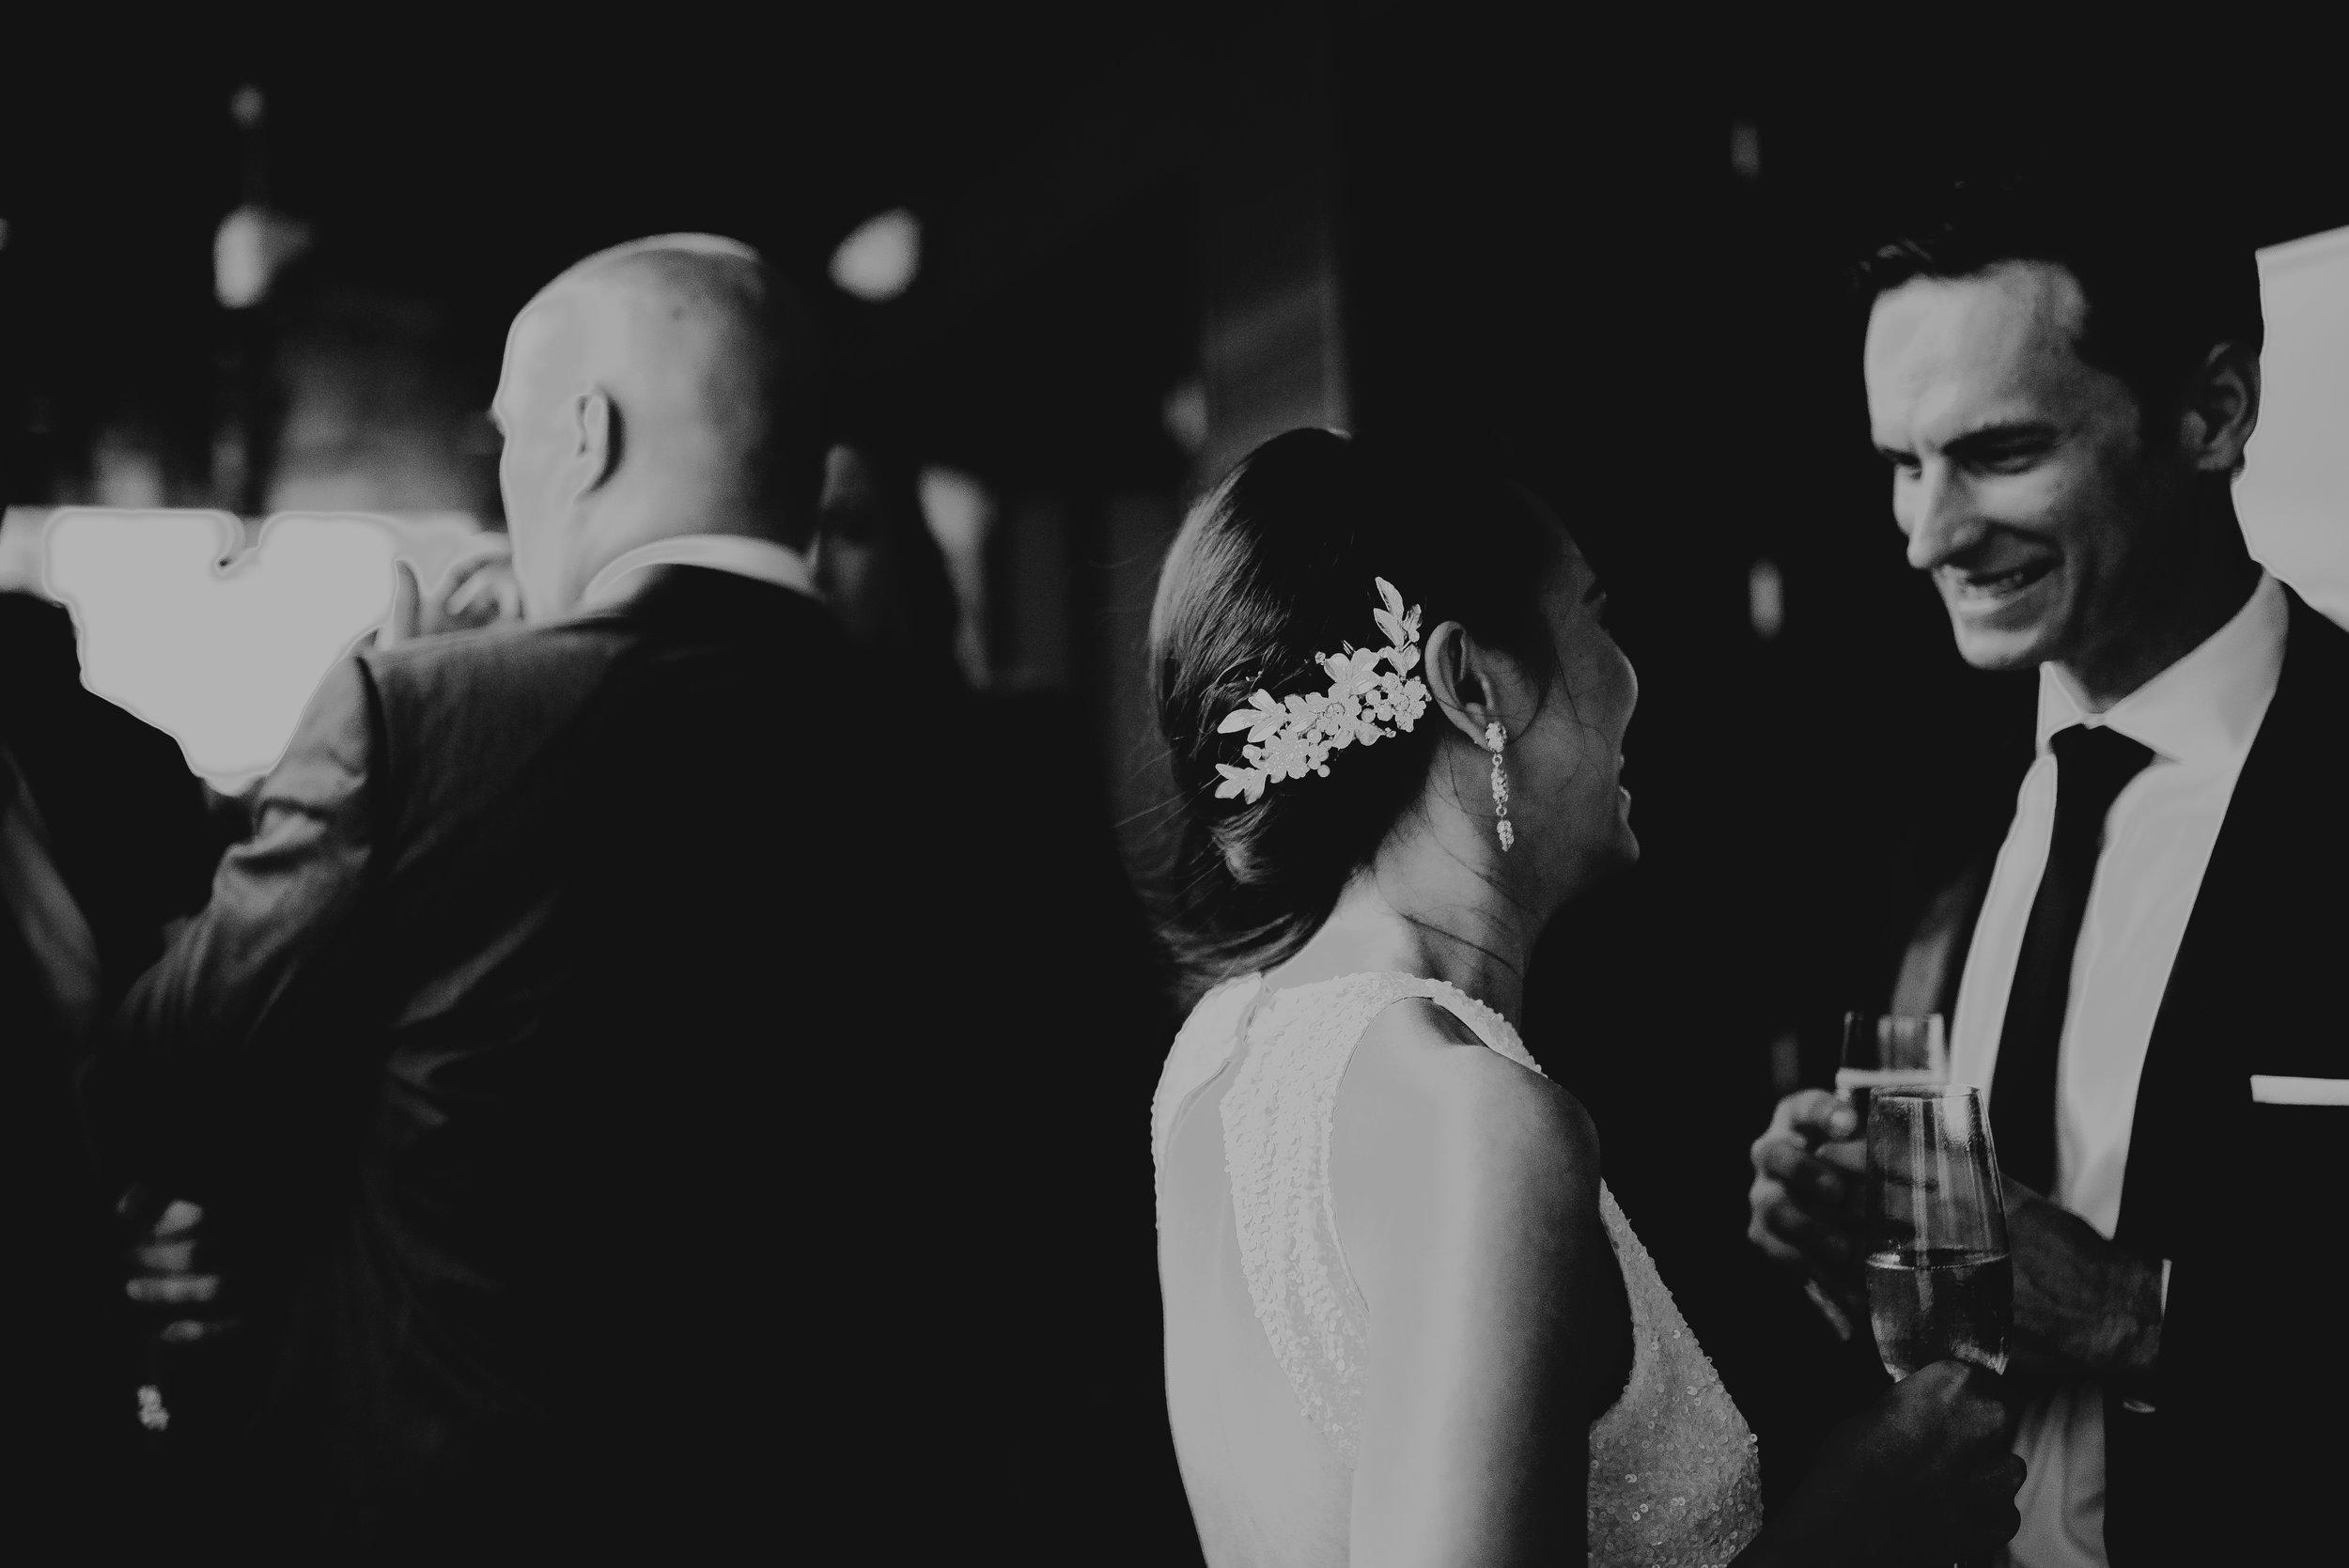 Stephen-Jennier-Longboat-Key-Florida-Wedding-243.jpg